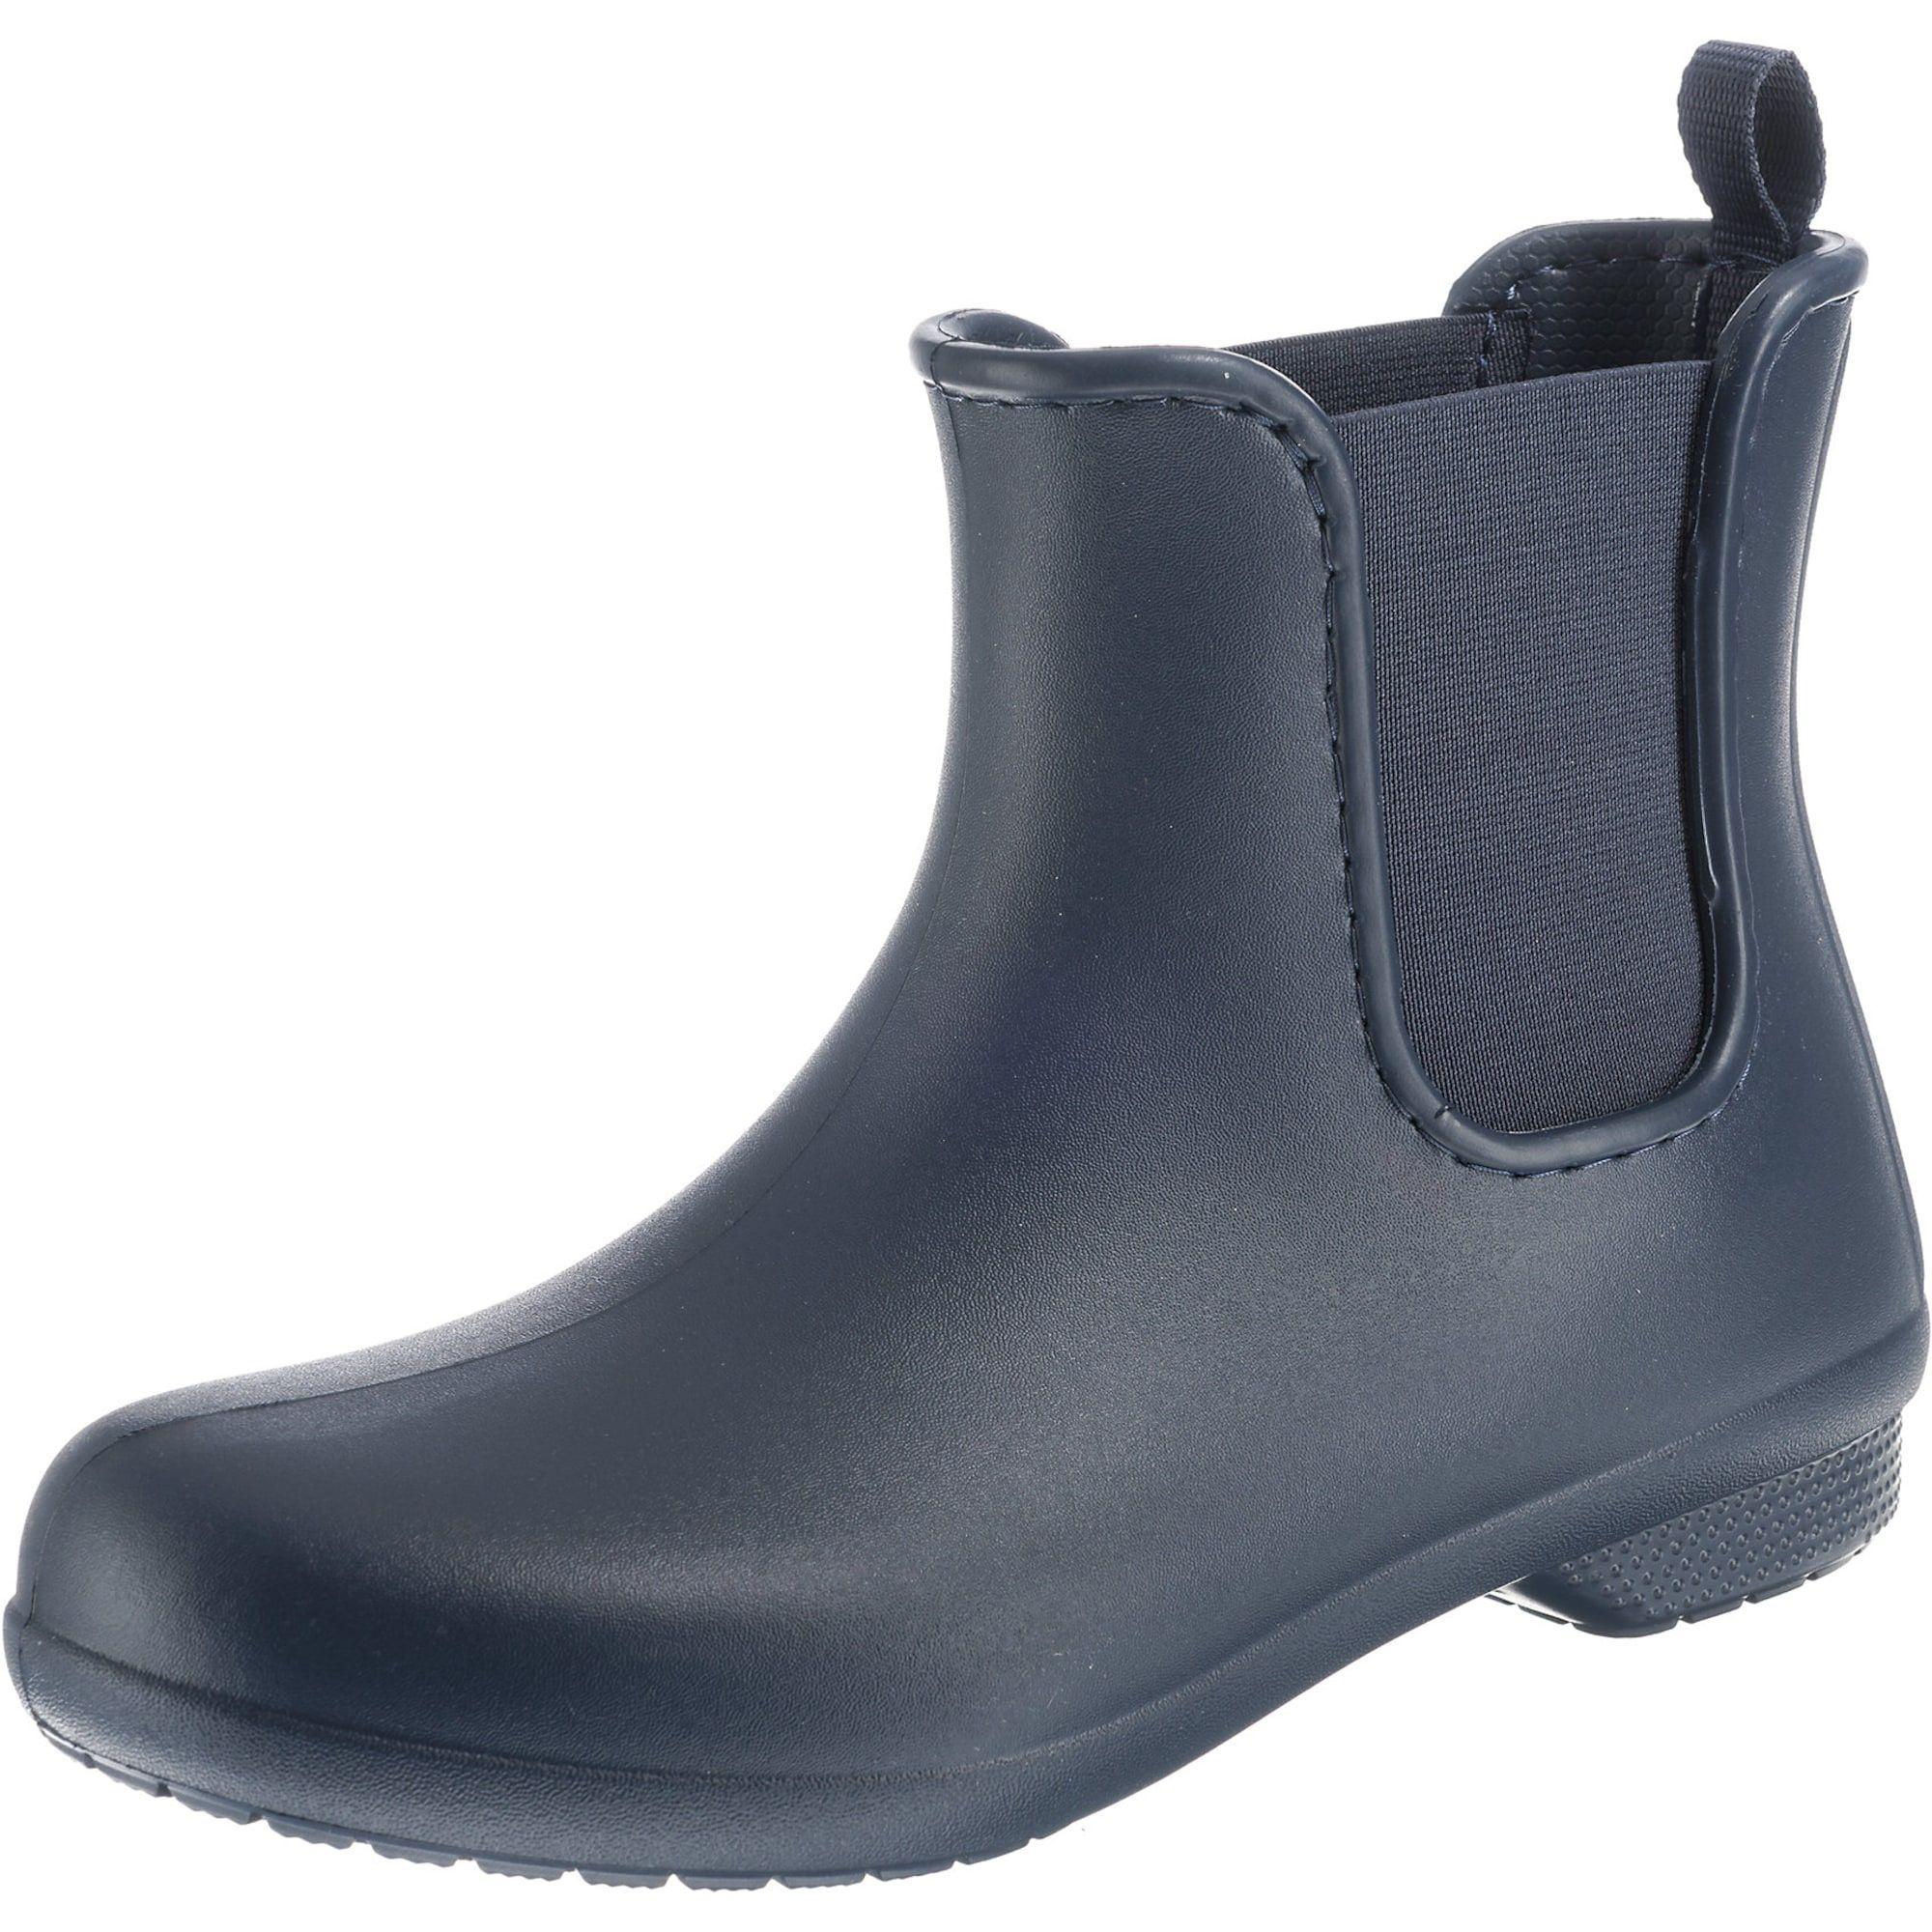 Gummistiefel ´Freesail Chelsea Boot W SGy/Dot´